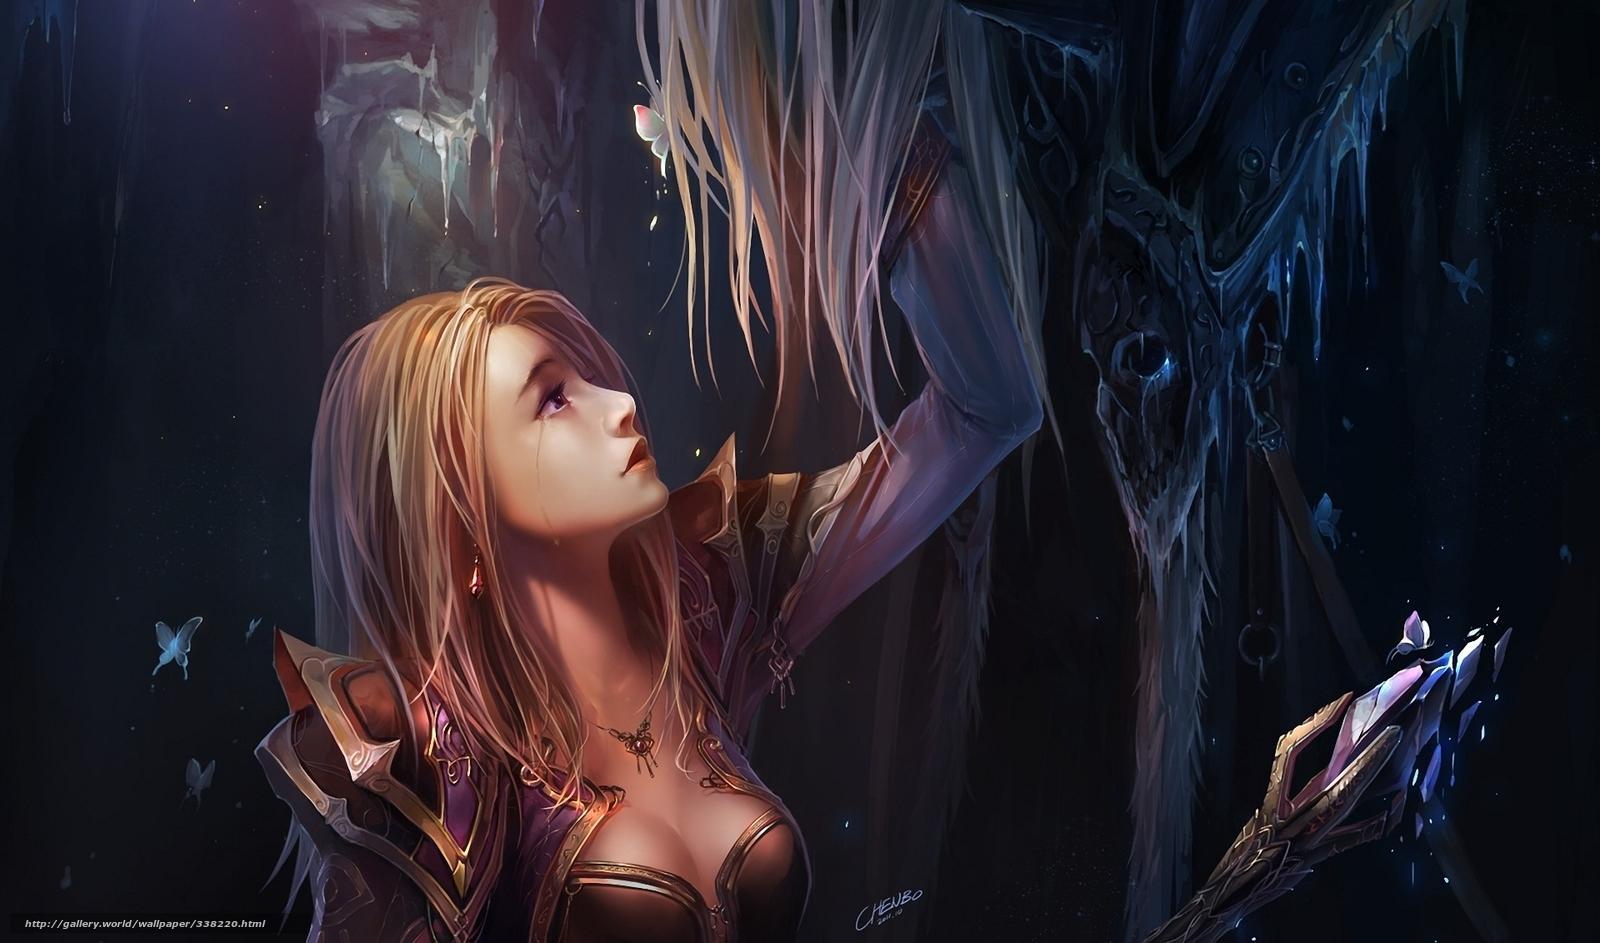 http://st.gdefon.com/wallpapers_original/wallpapers/338220_art_devushka_slezy_posox_kristall_razbityj_babochk_1920x1131_(www.GdeFon.ru).jpg